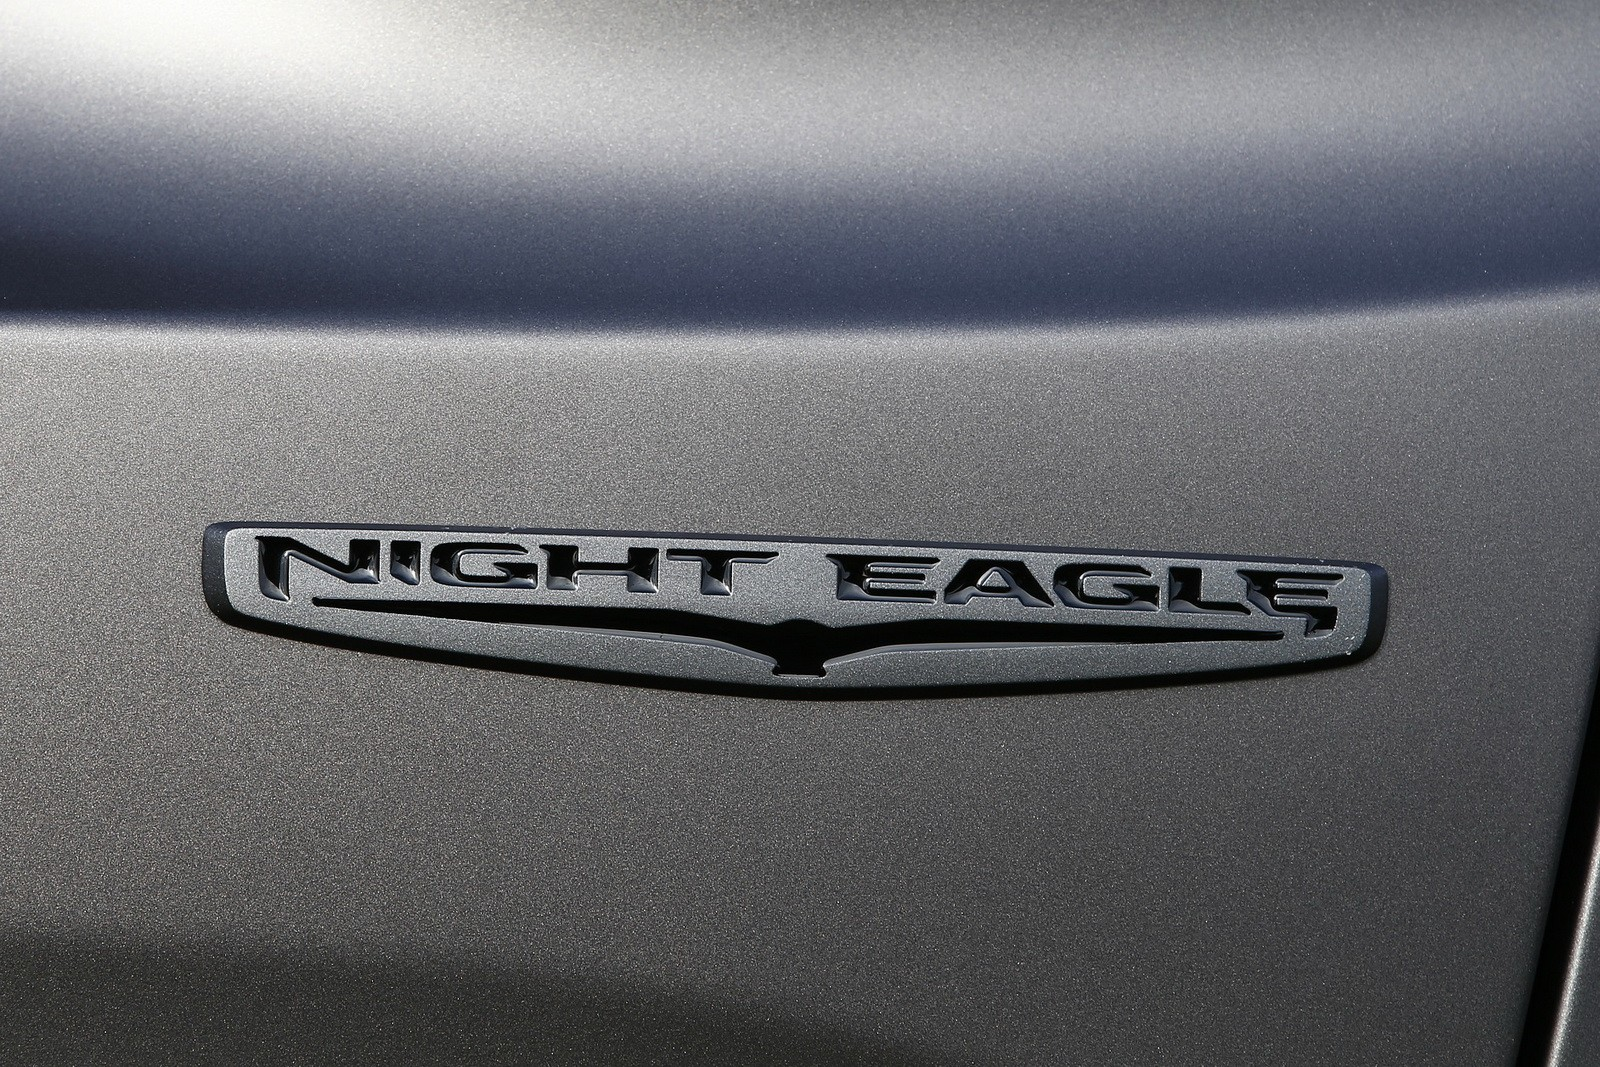 Renegade Night Eagle Special Edition Emea Region Jeep Renegade